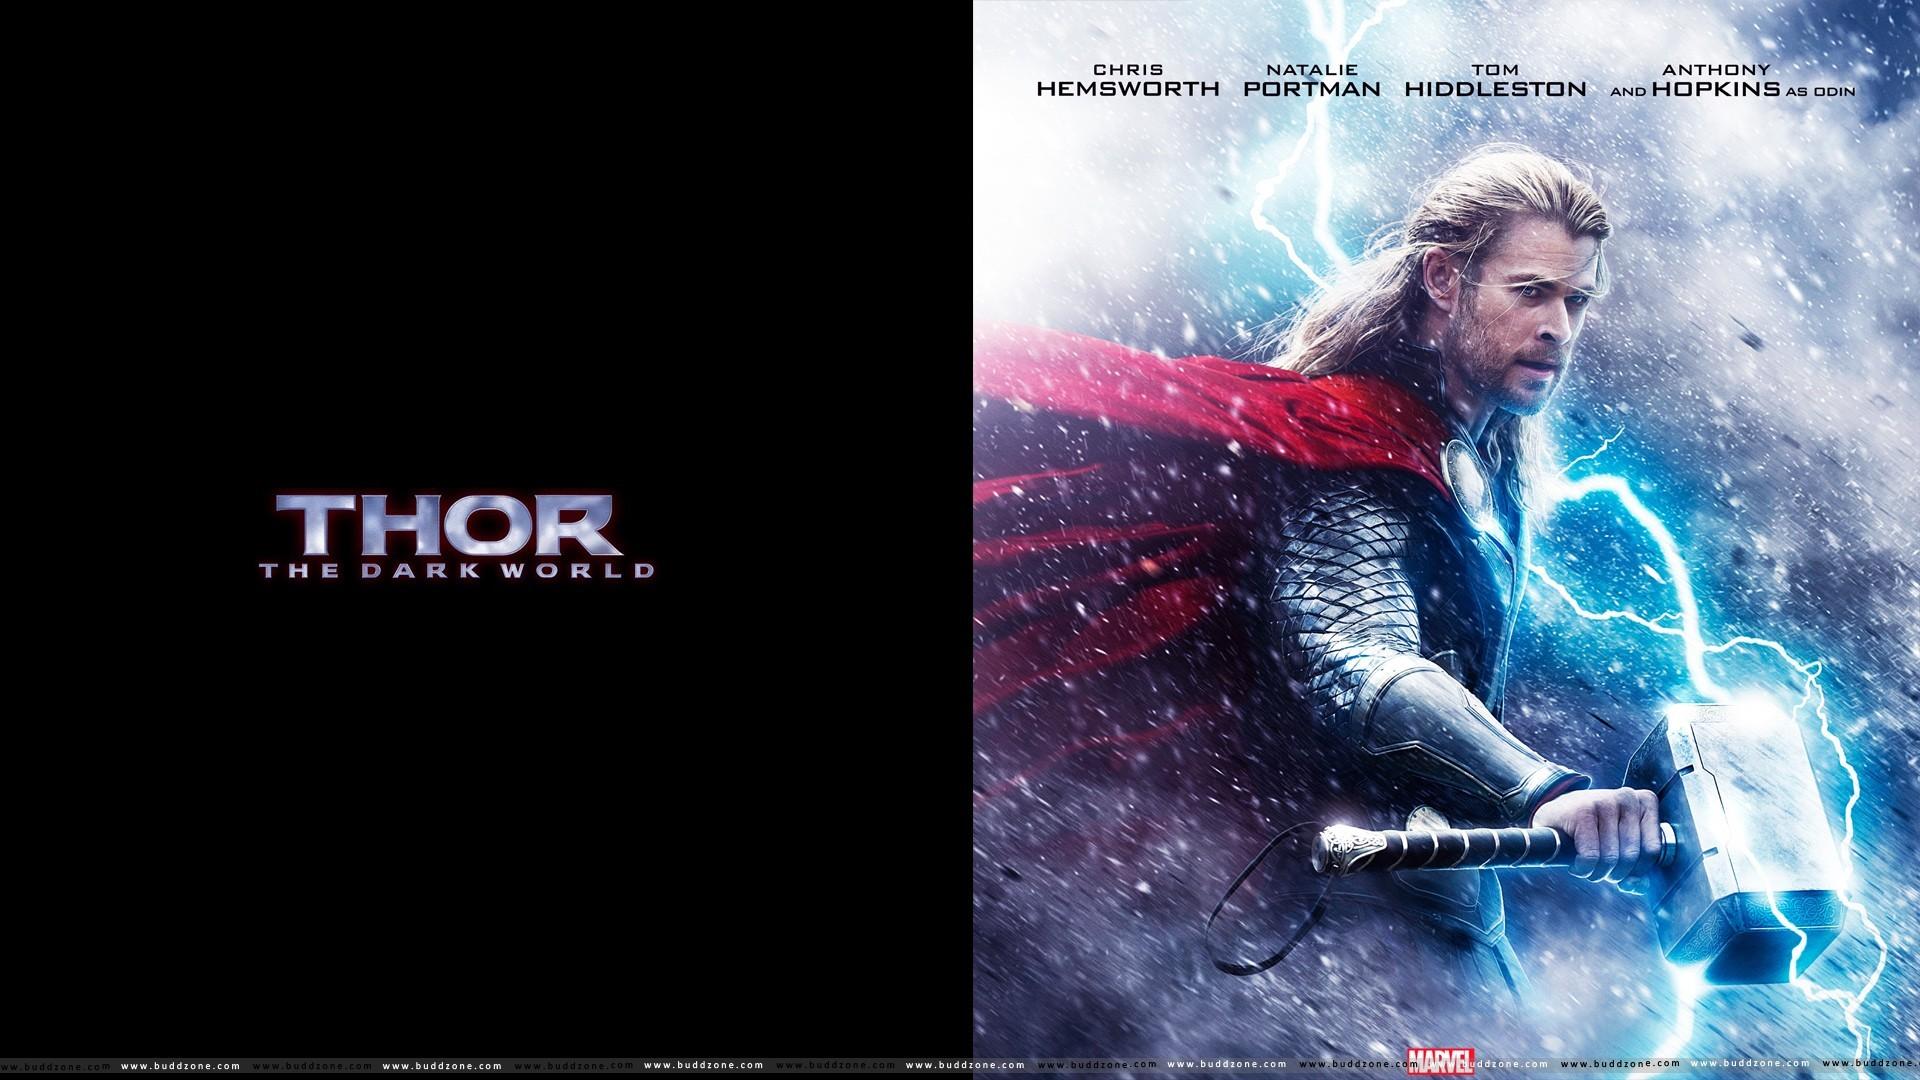 wallpaper : movies, thor 2 the dark world, mjolnir, chris hemsworth